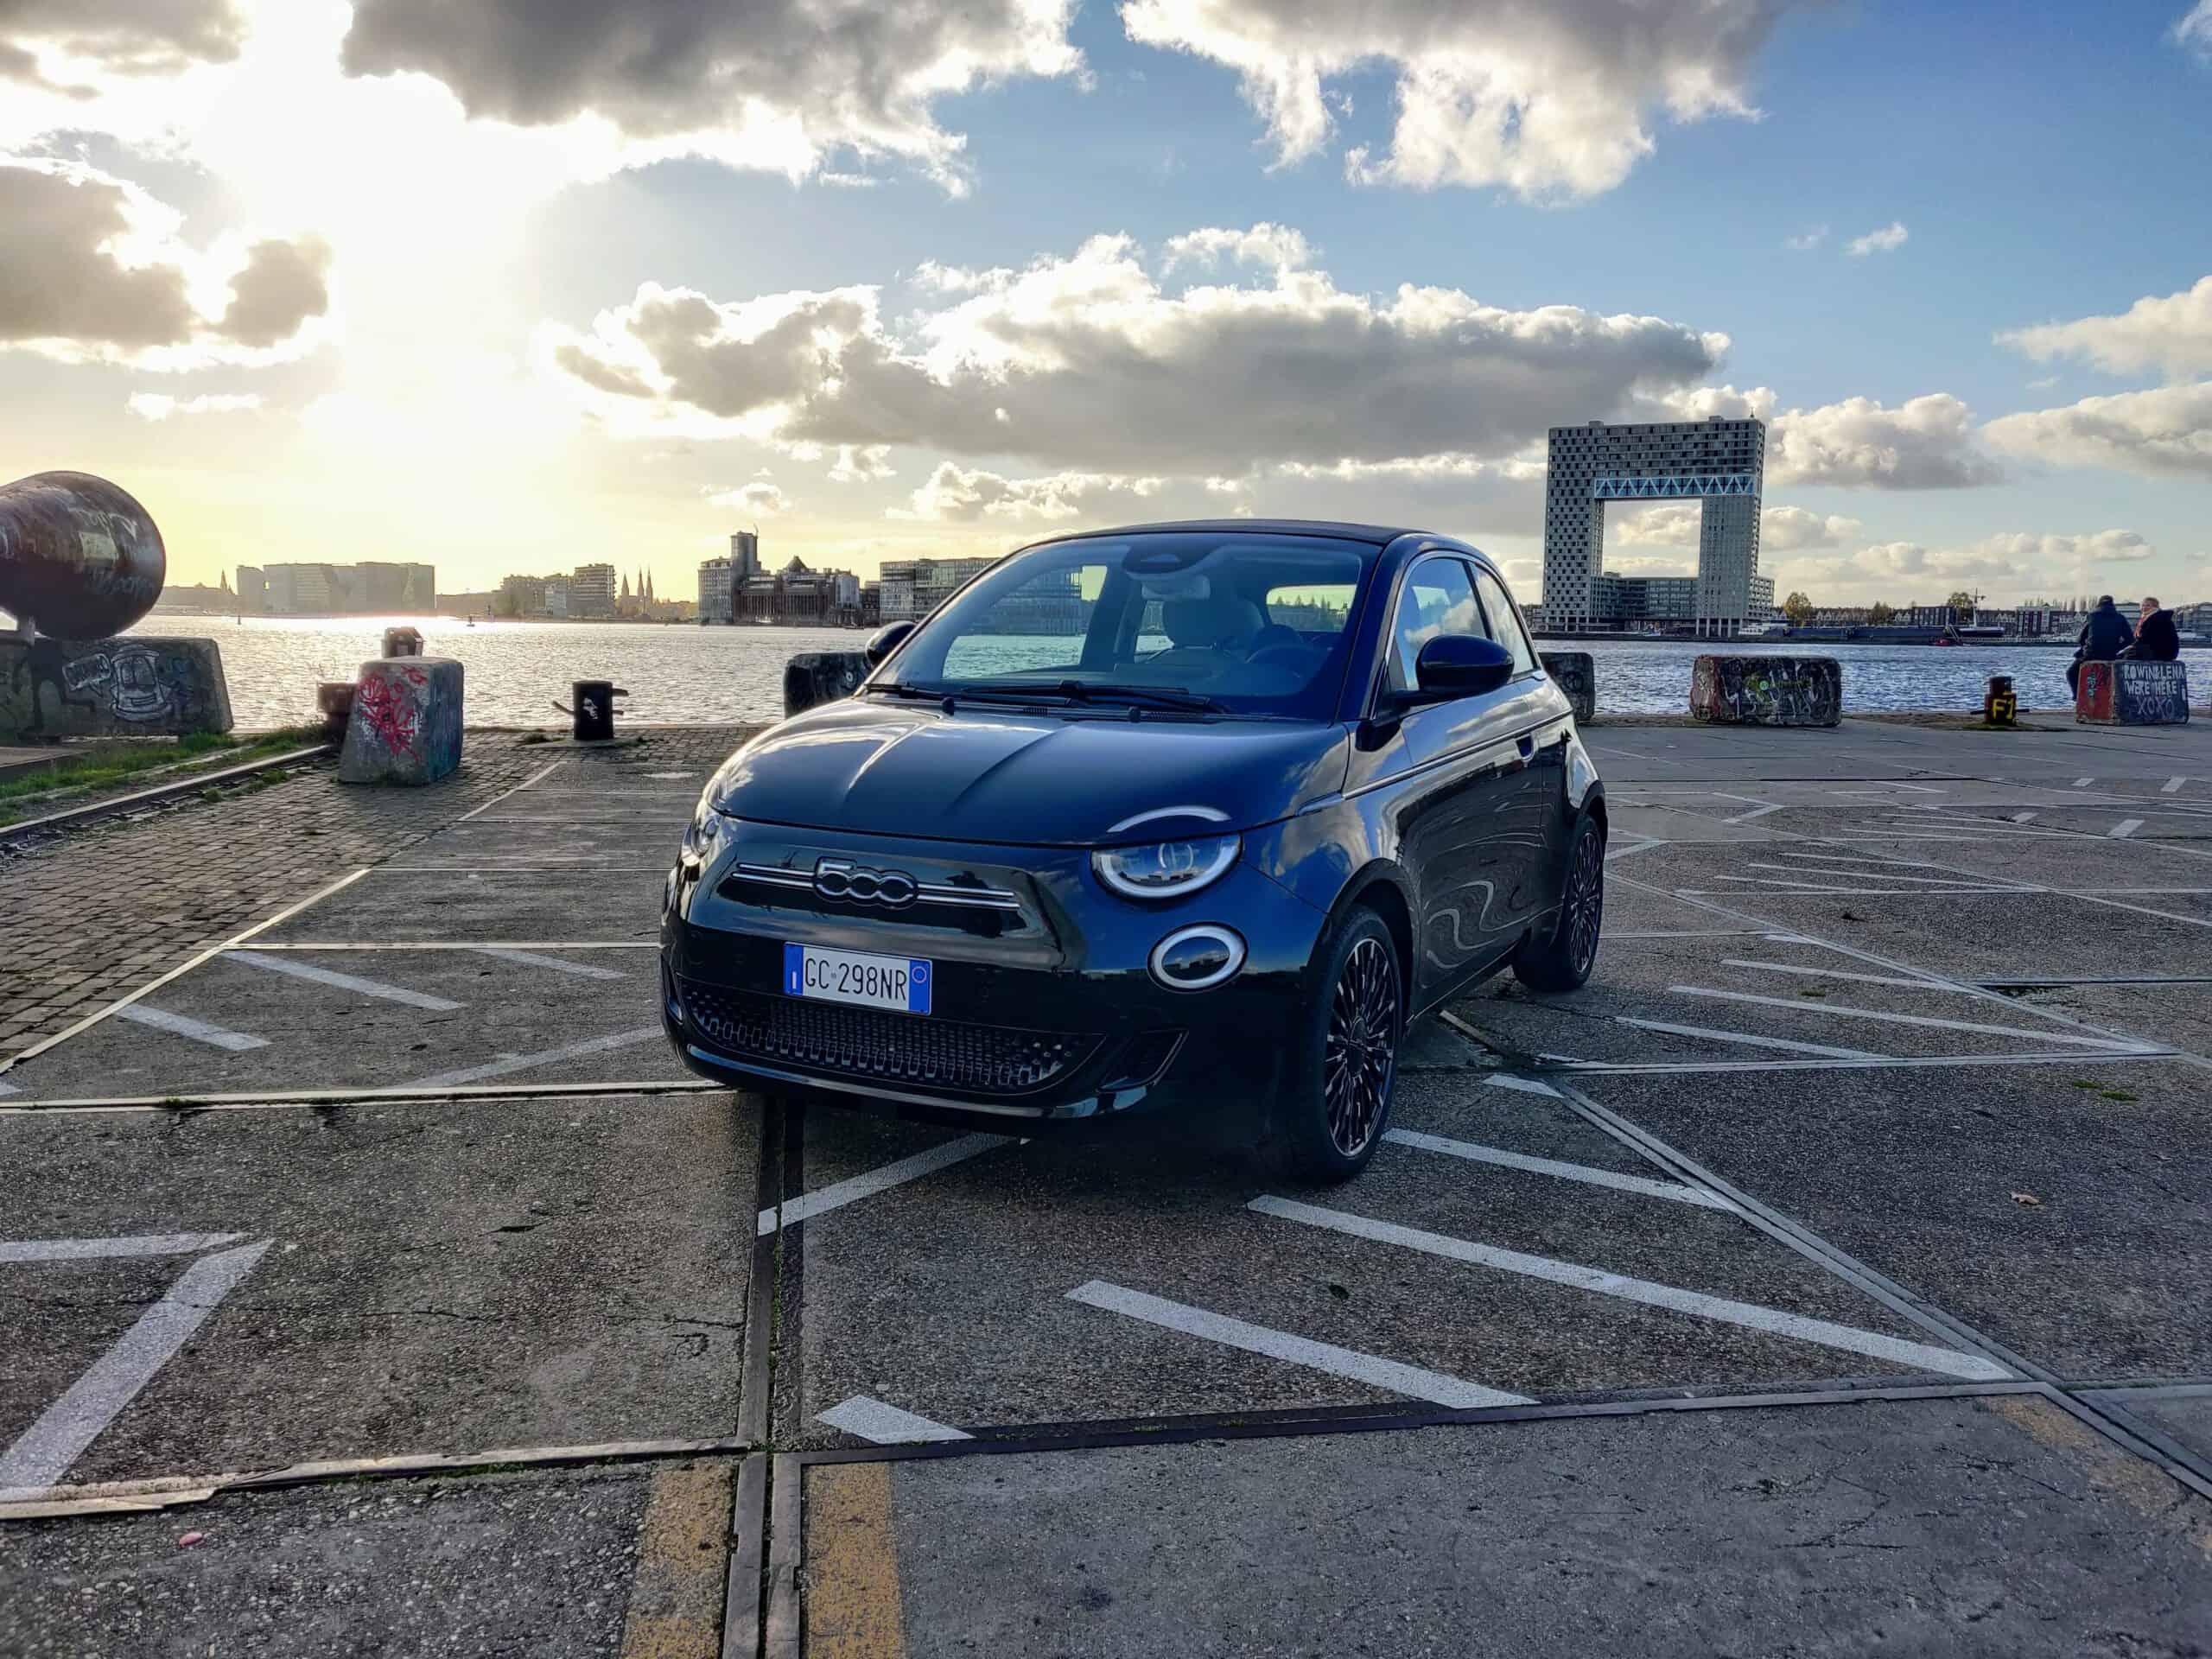 Fiat 500e, de ultieme stadsauto